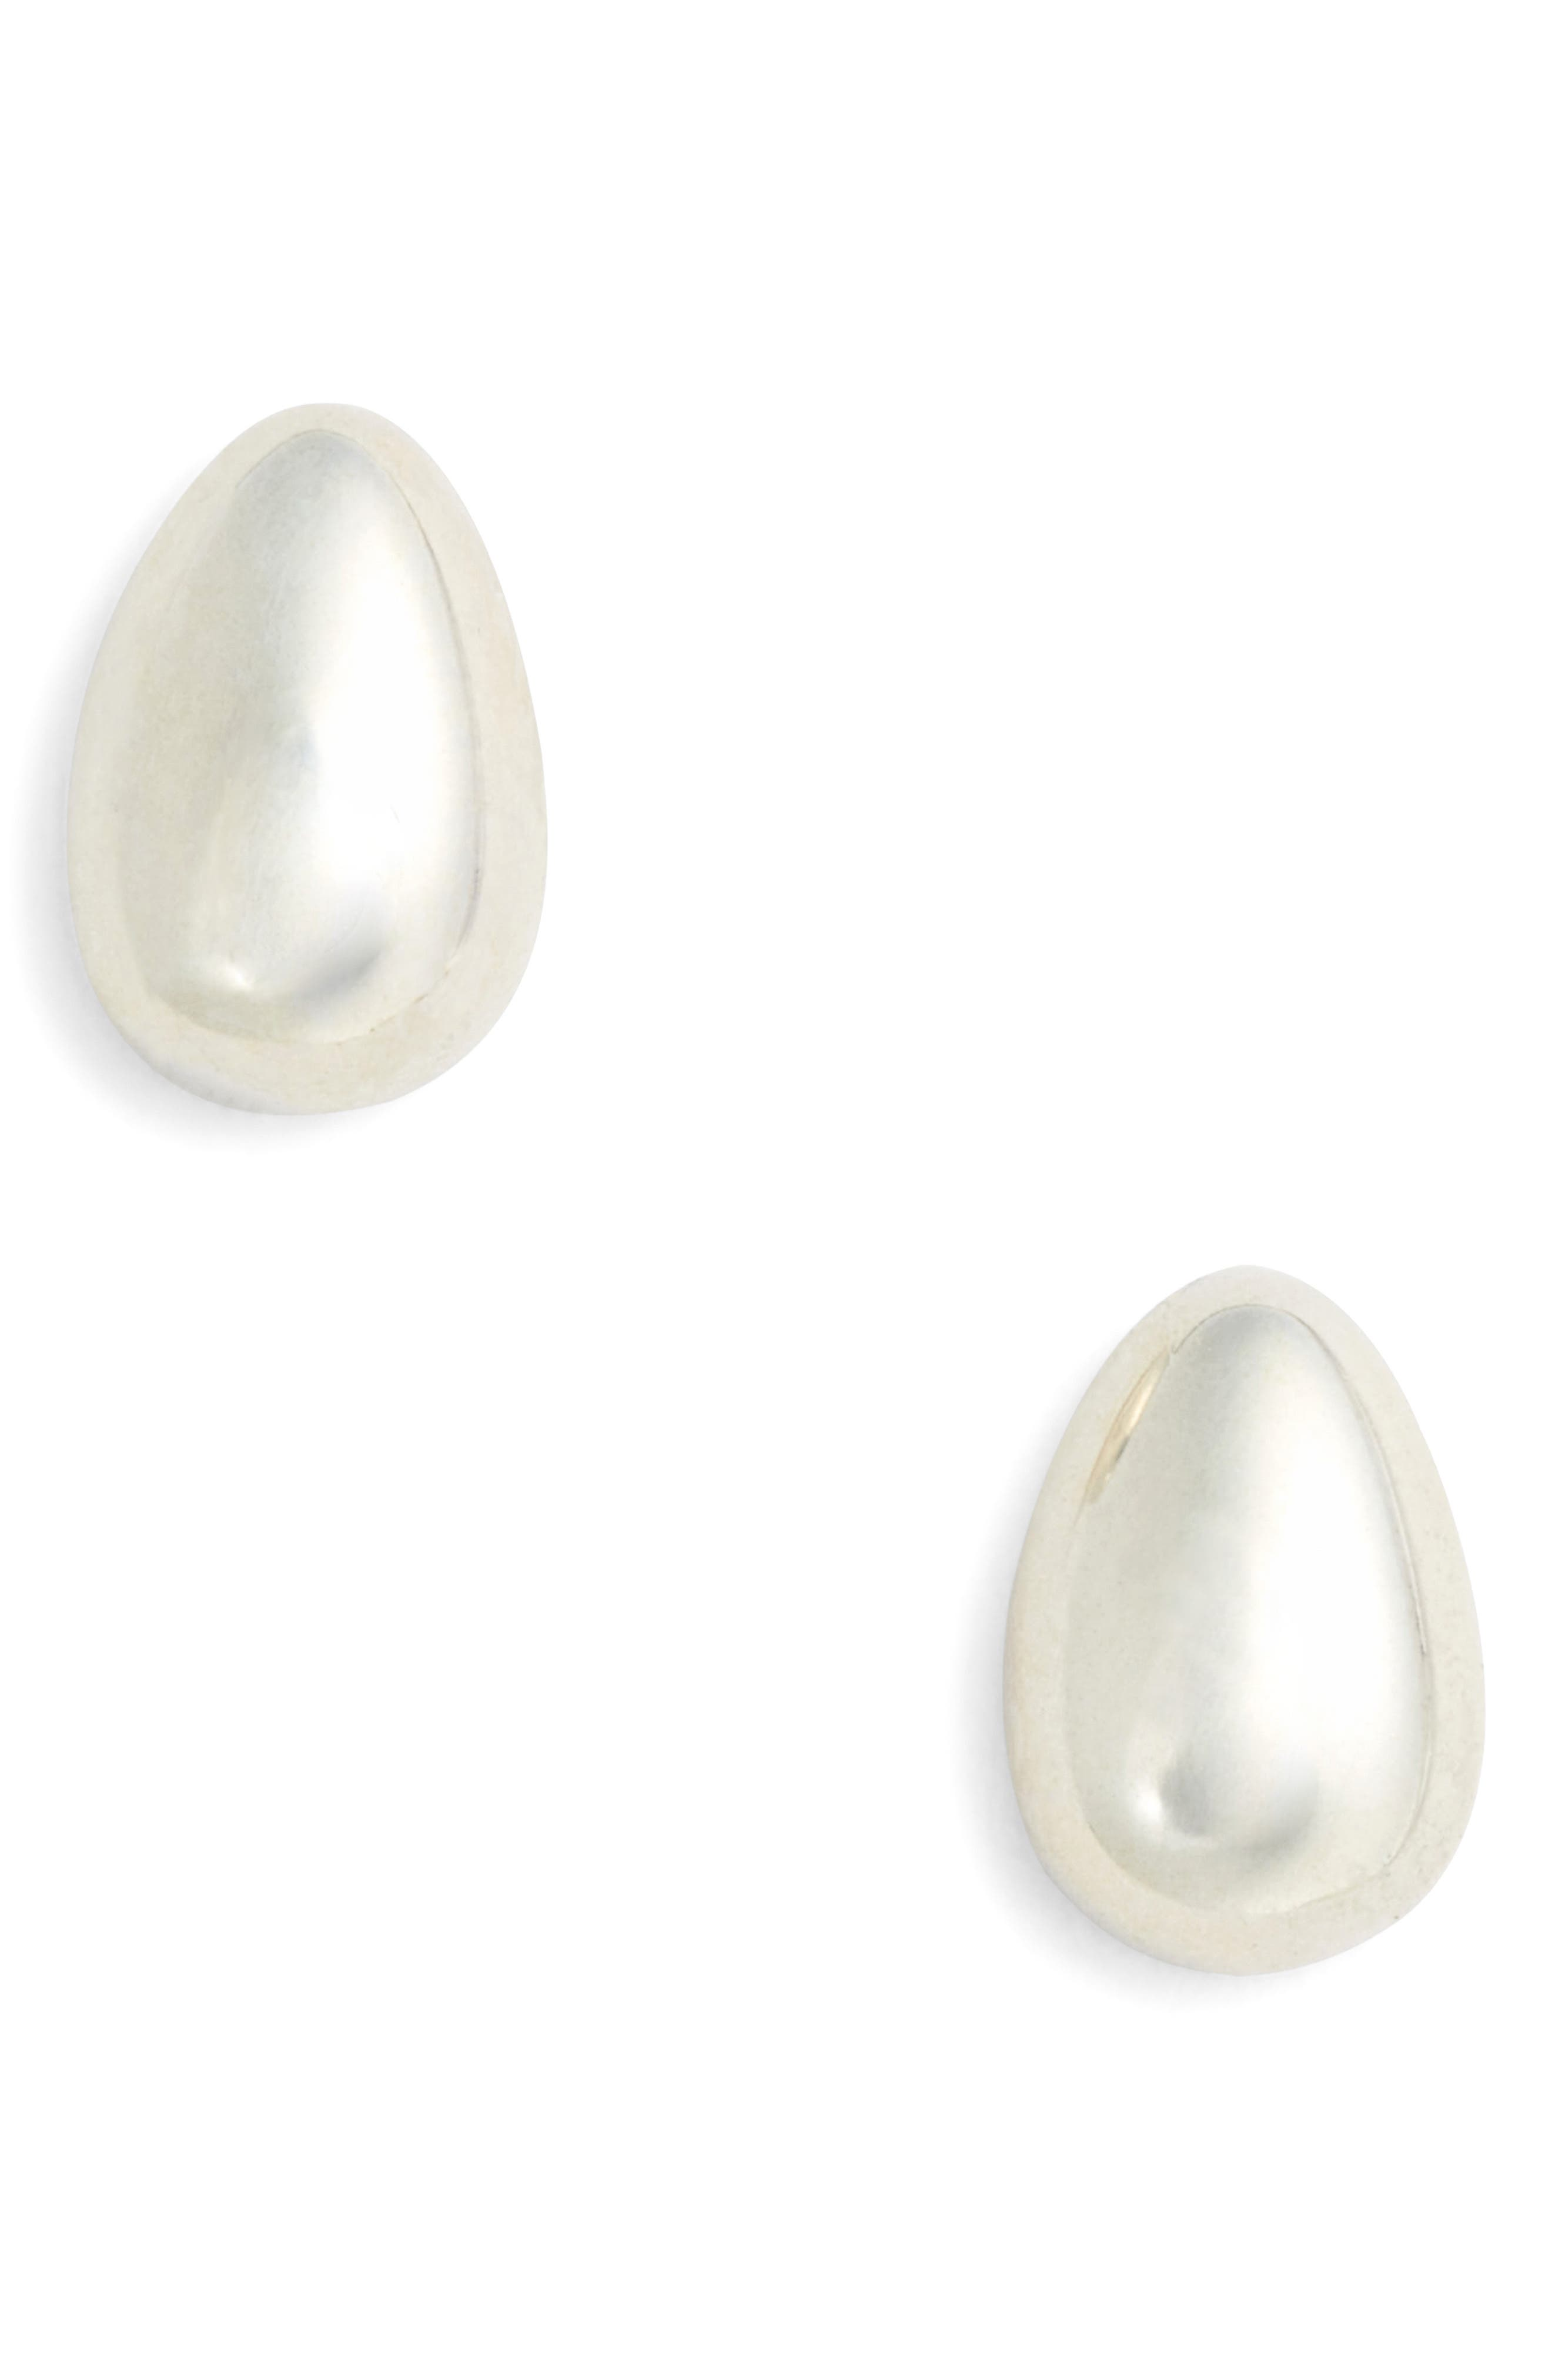 Tiny Egg Stud Earrings,                             Main thumbnail 1, color,                             040